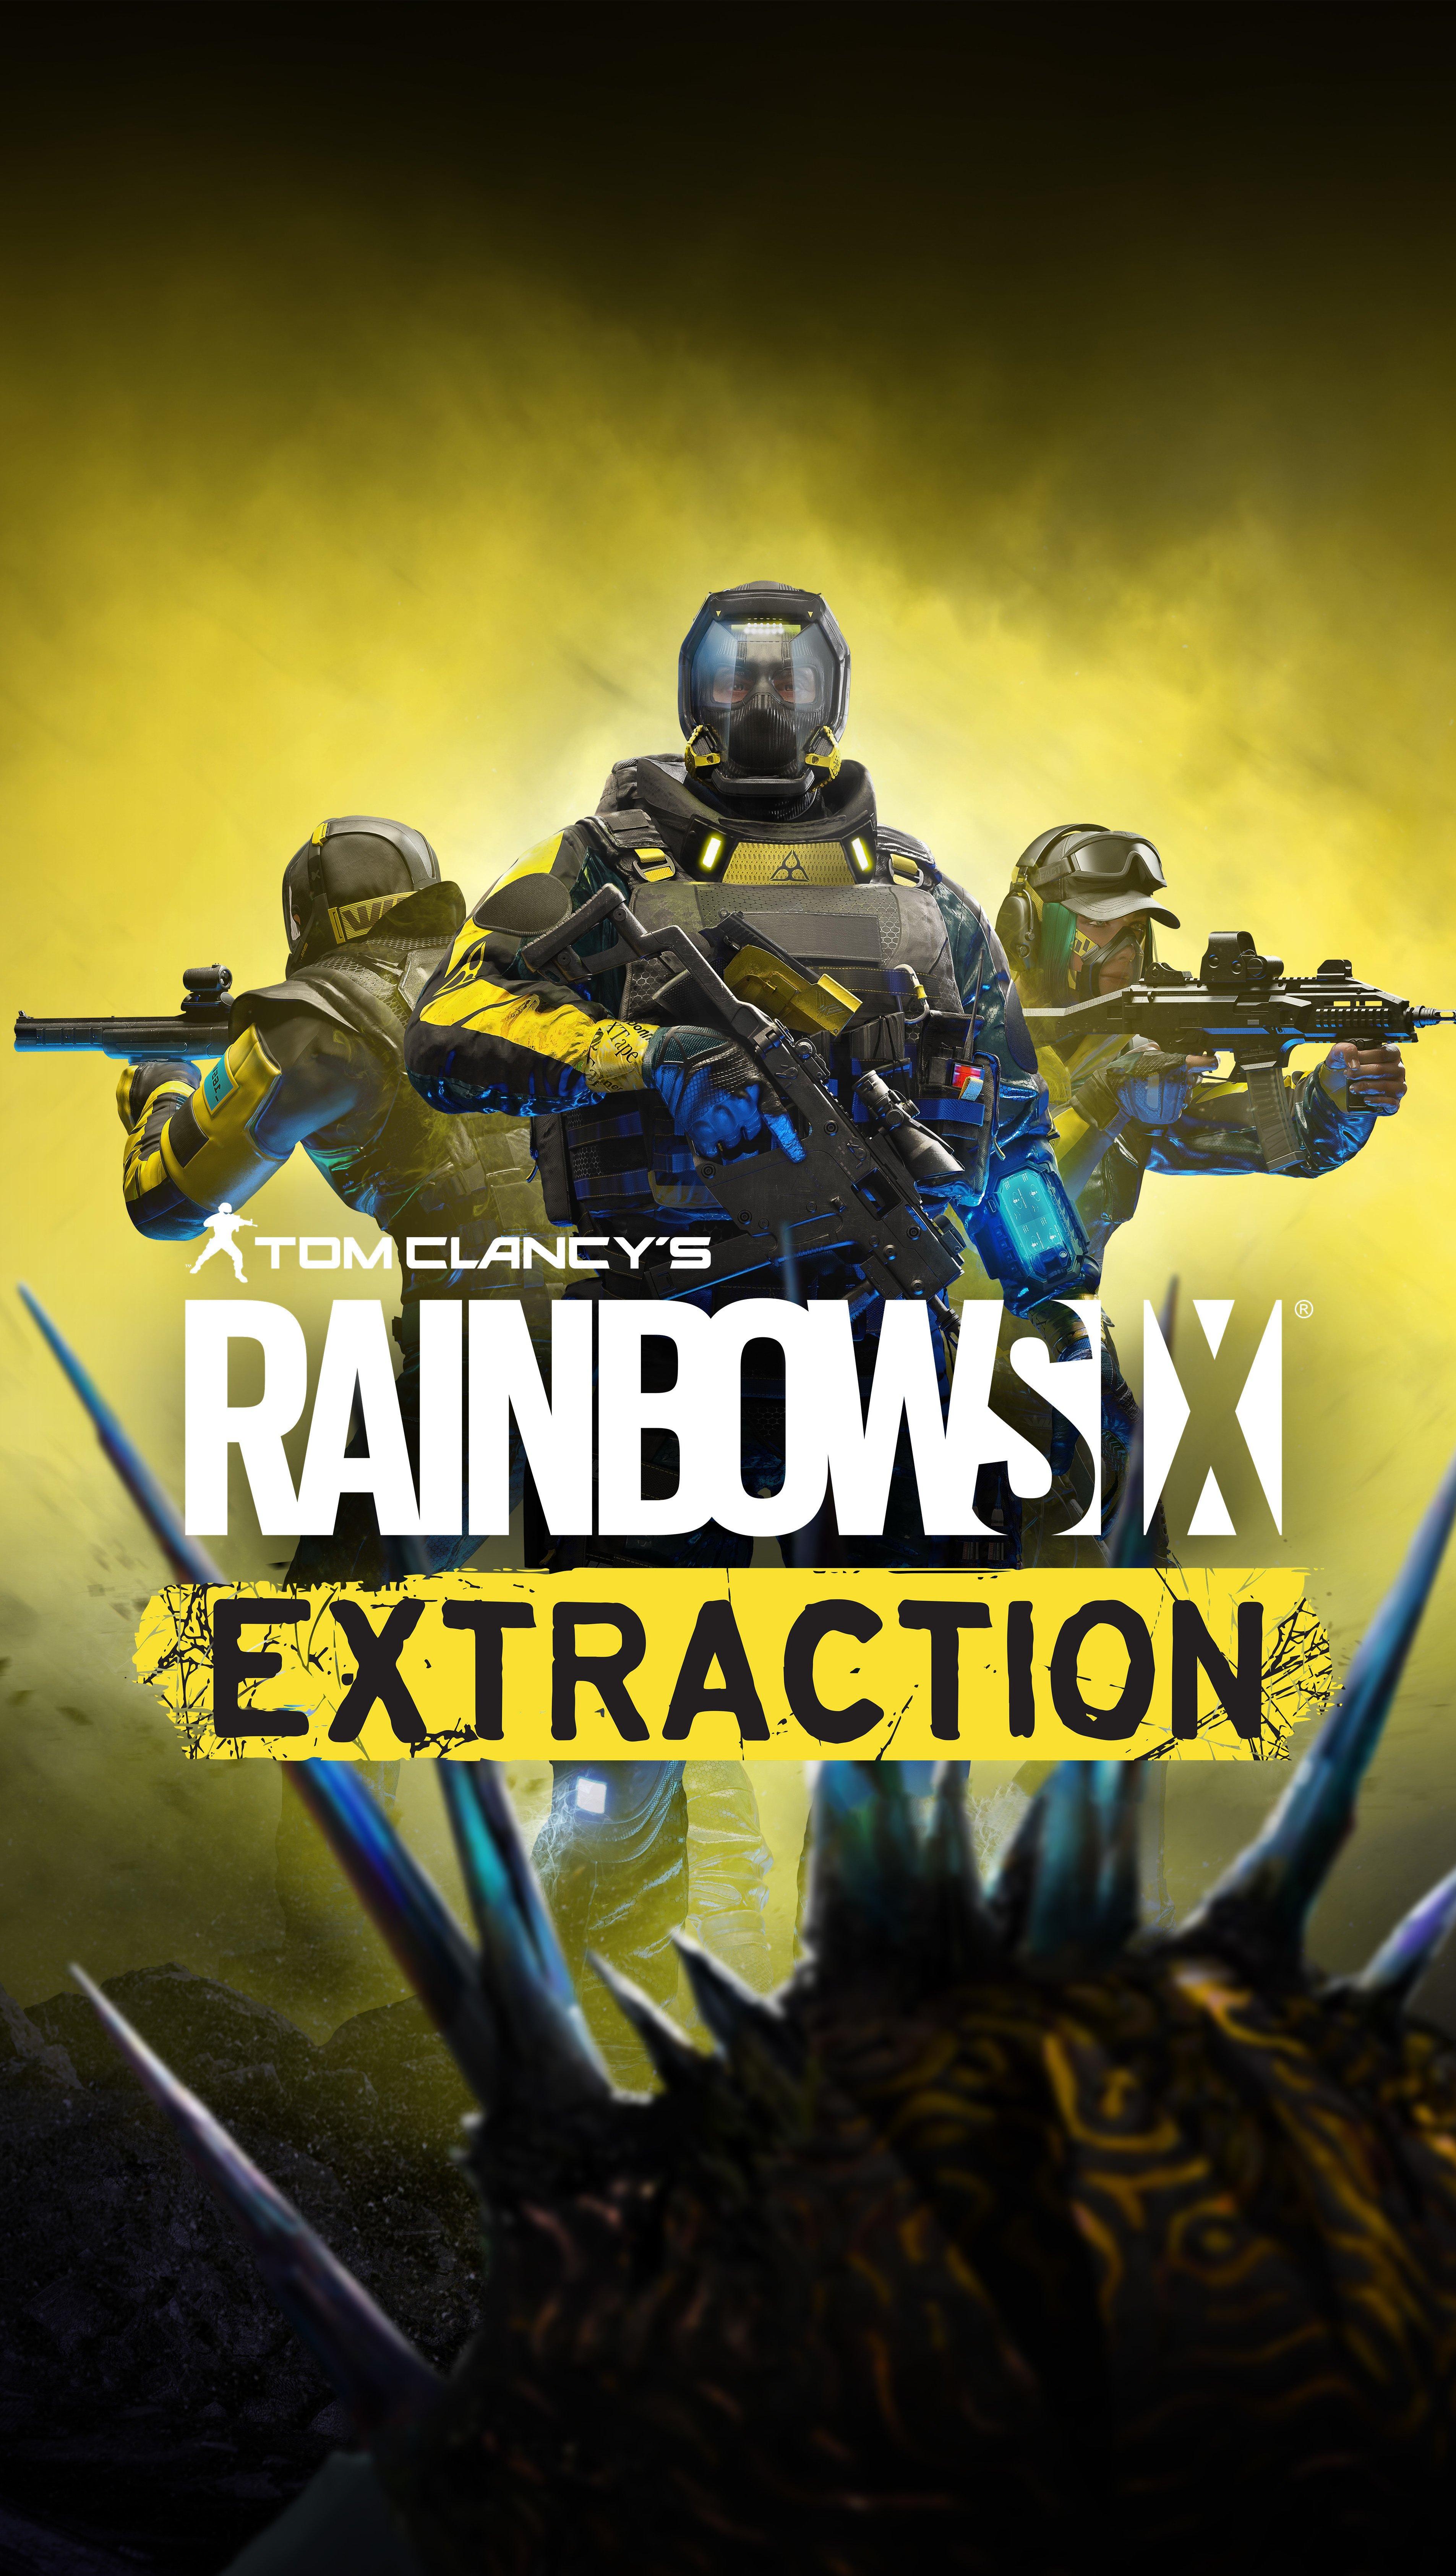 Fondos de pantalla Tom Clancy's Rainbow Six Extraction Vertical